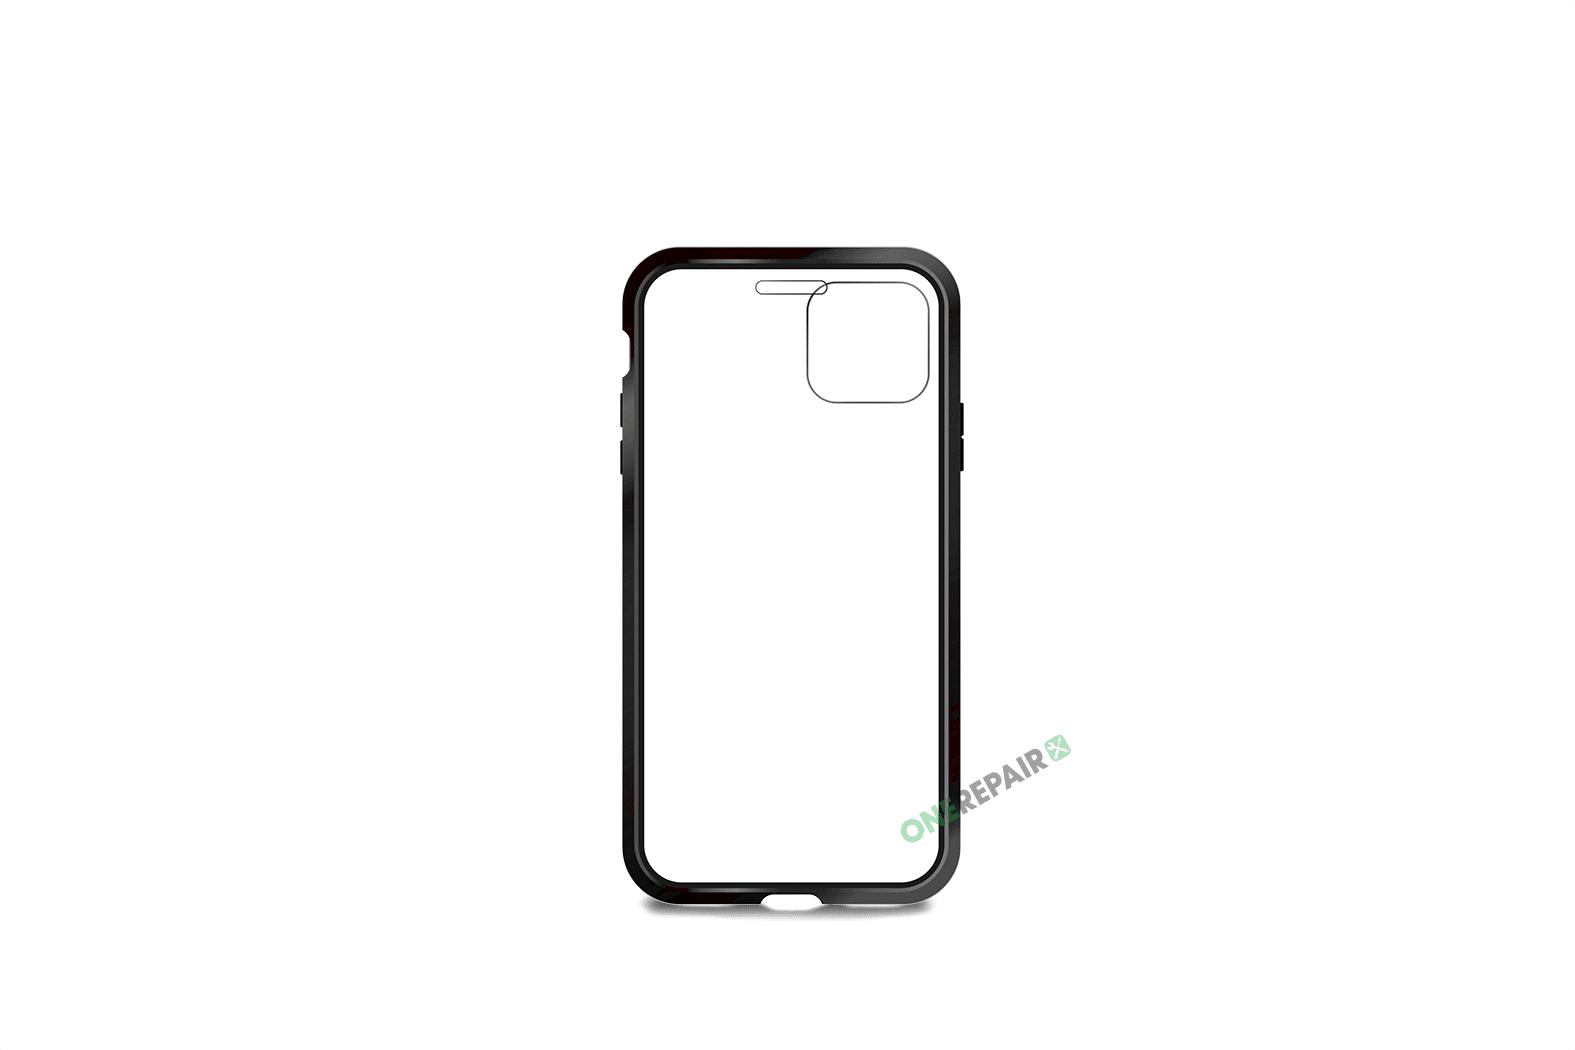 353788-001_iPhone_11_Magnetisk_Case_Sort_OneRepair_00001